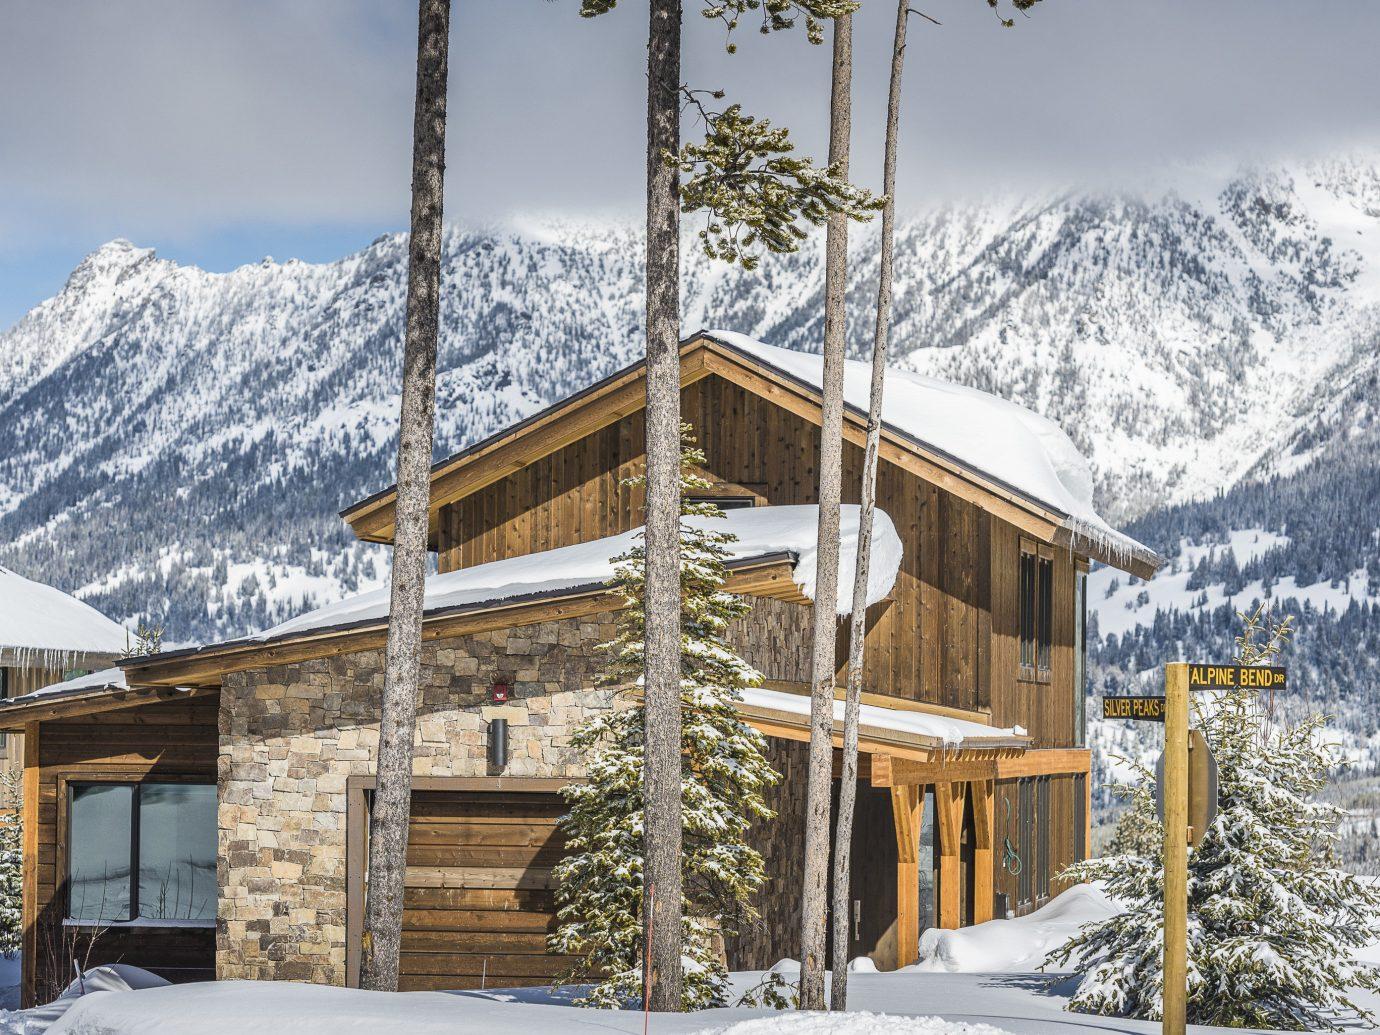 Hotels snow mountain sky outdoor Winter Resort weather mountain range piste season log cabin home house alps area